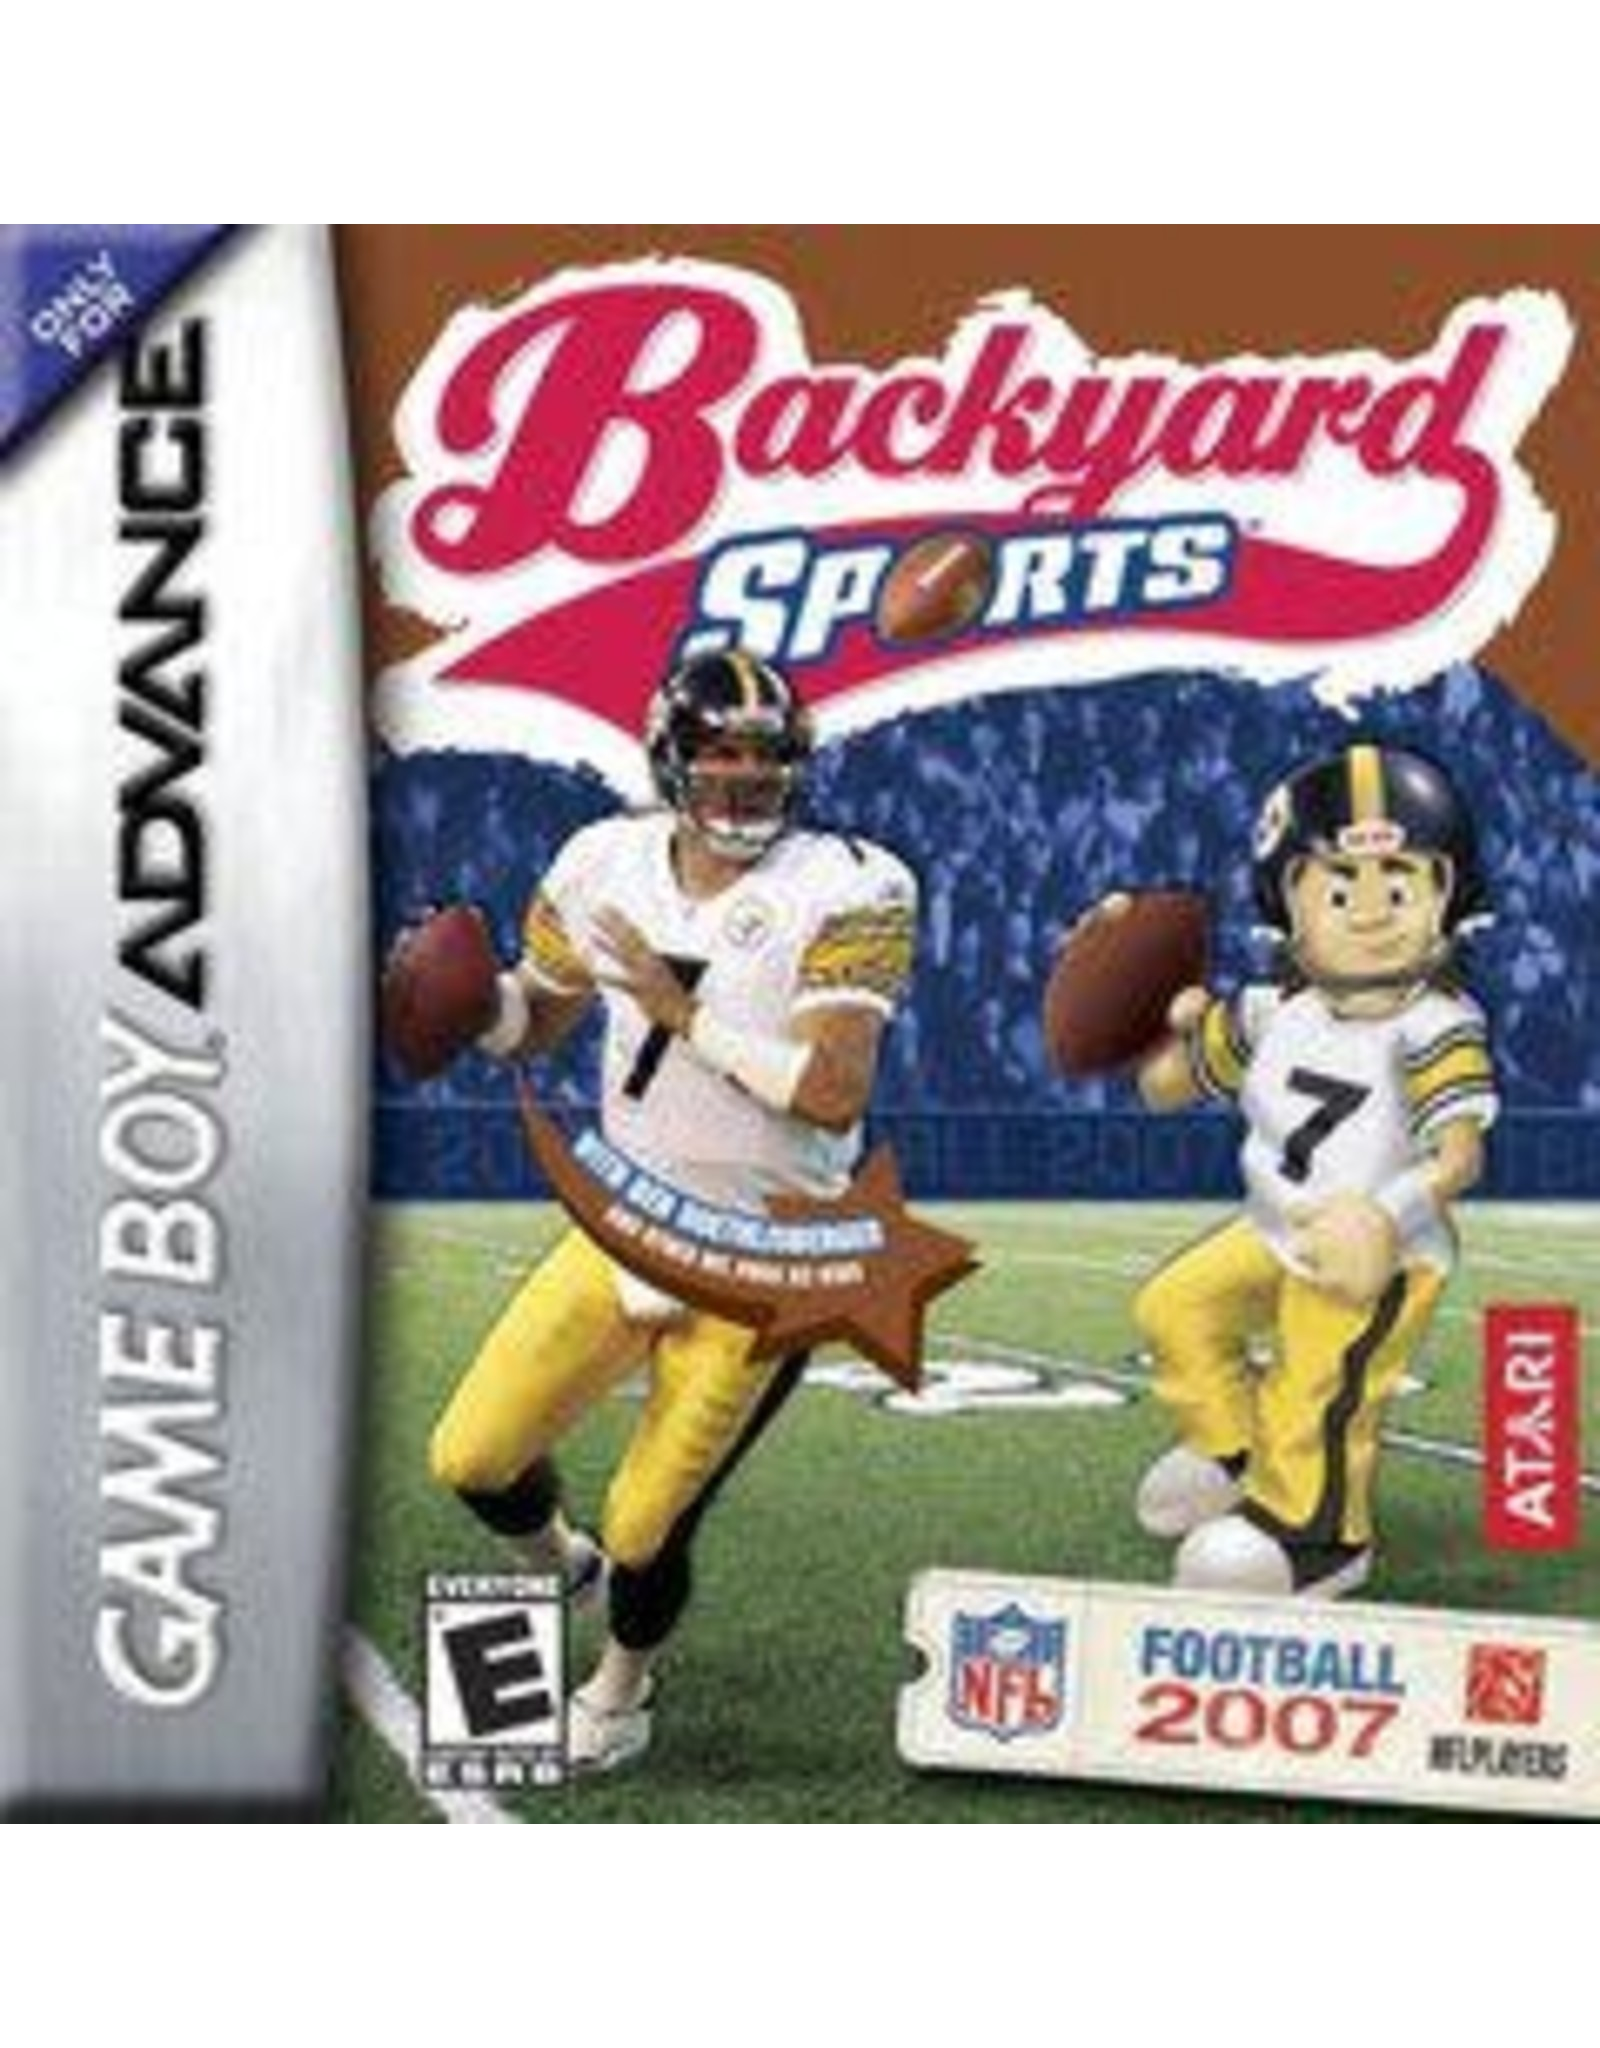 GameBoy Advance Backyard Football 2007 (CiB)